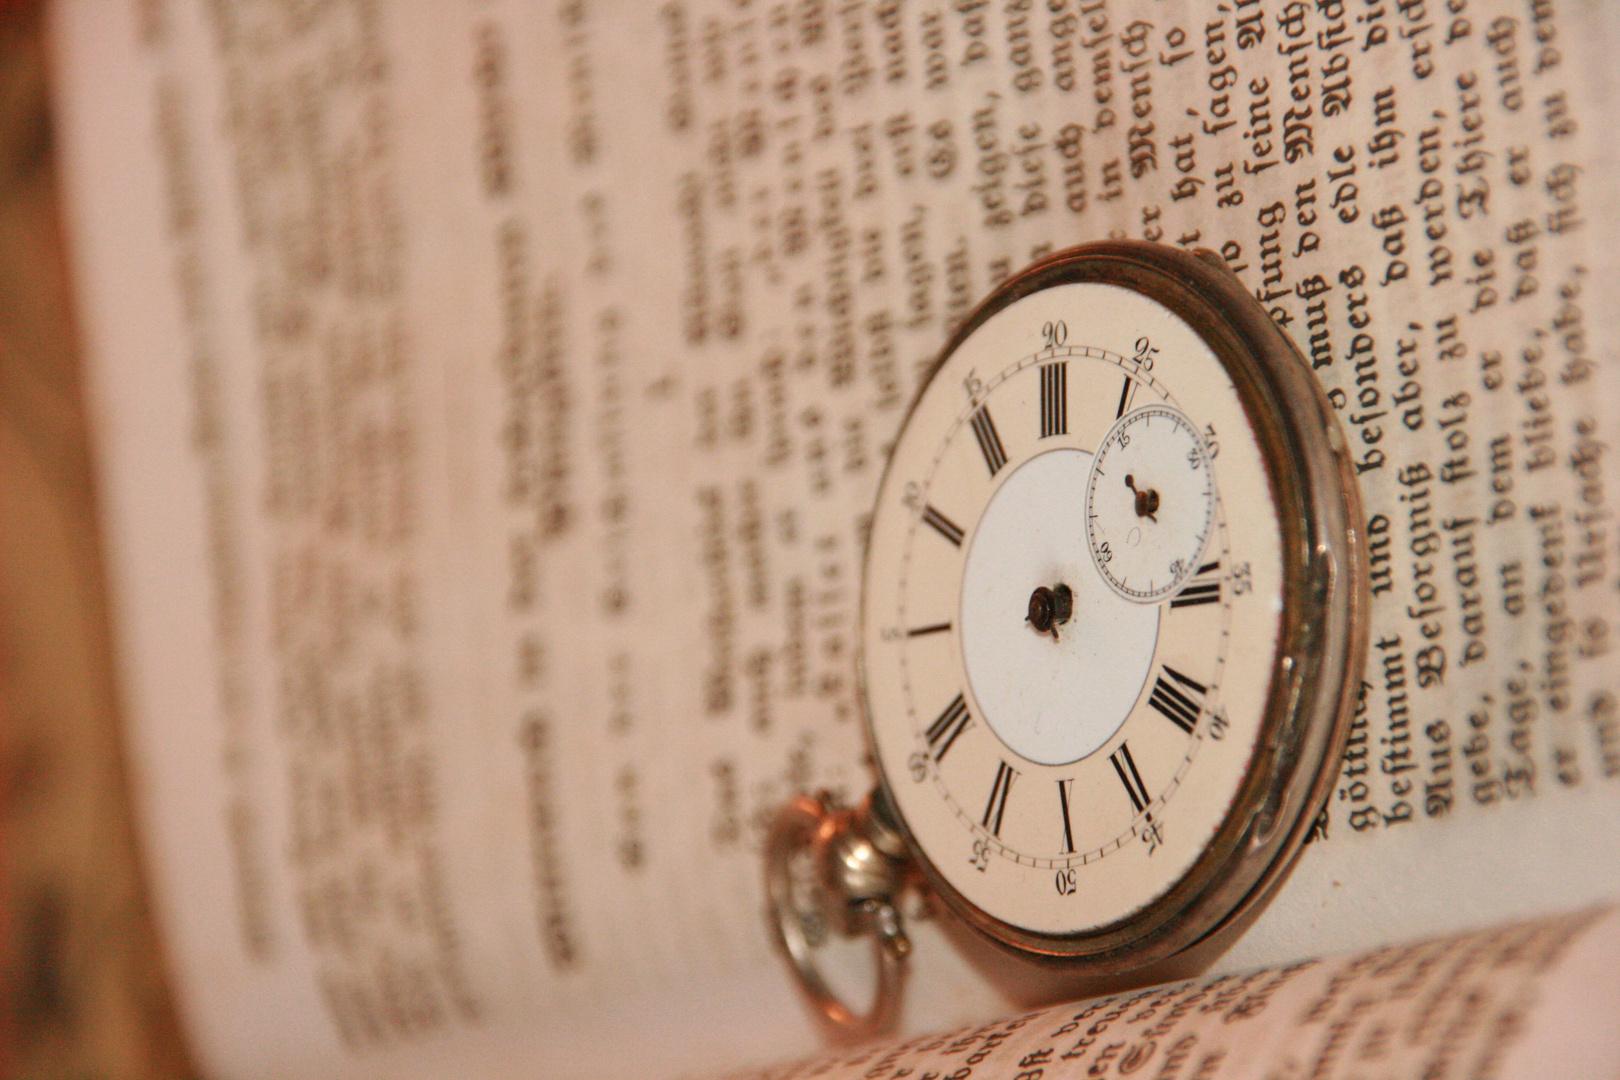 Alte Uhr auf Bibel ...